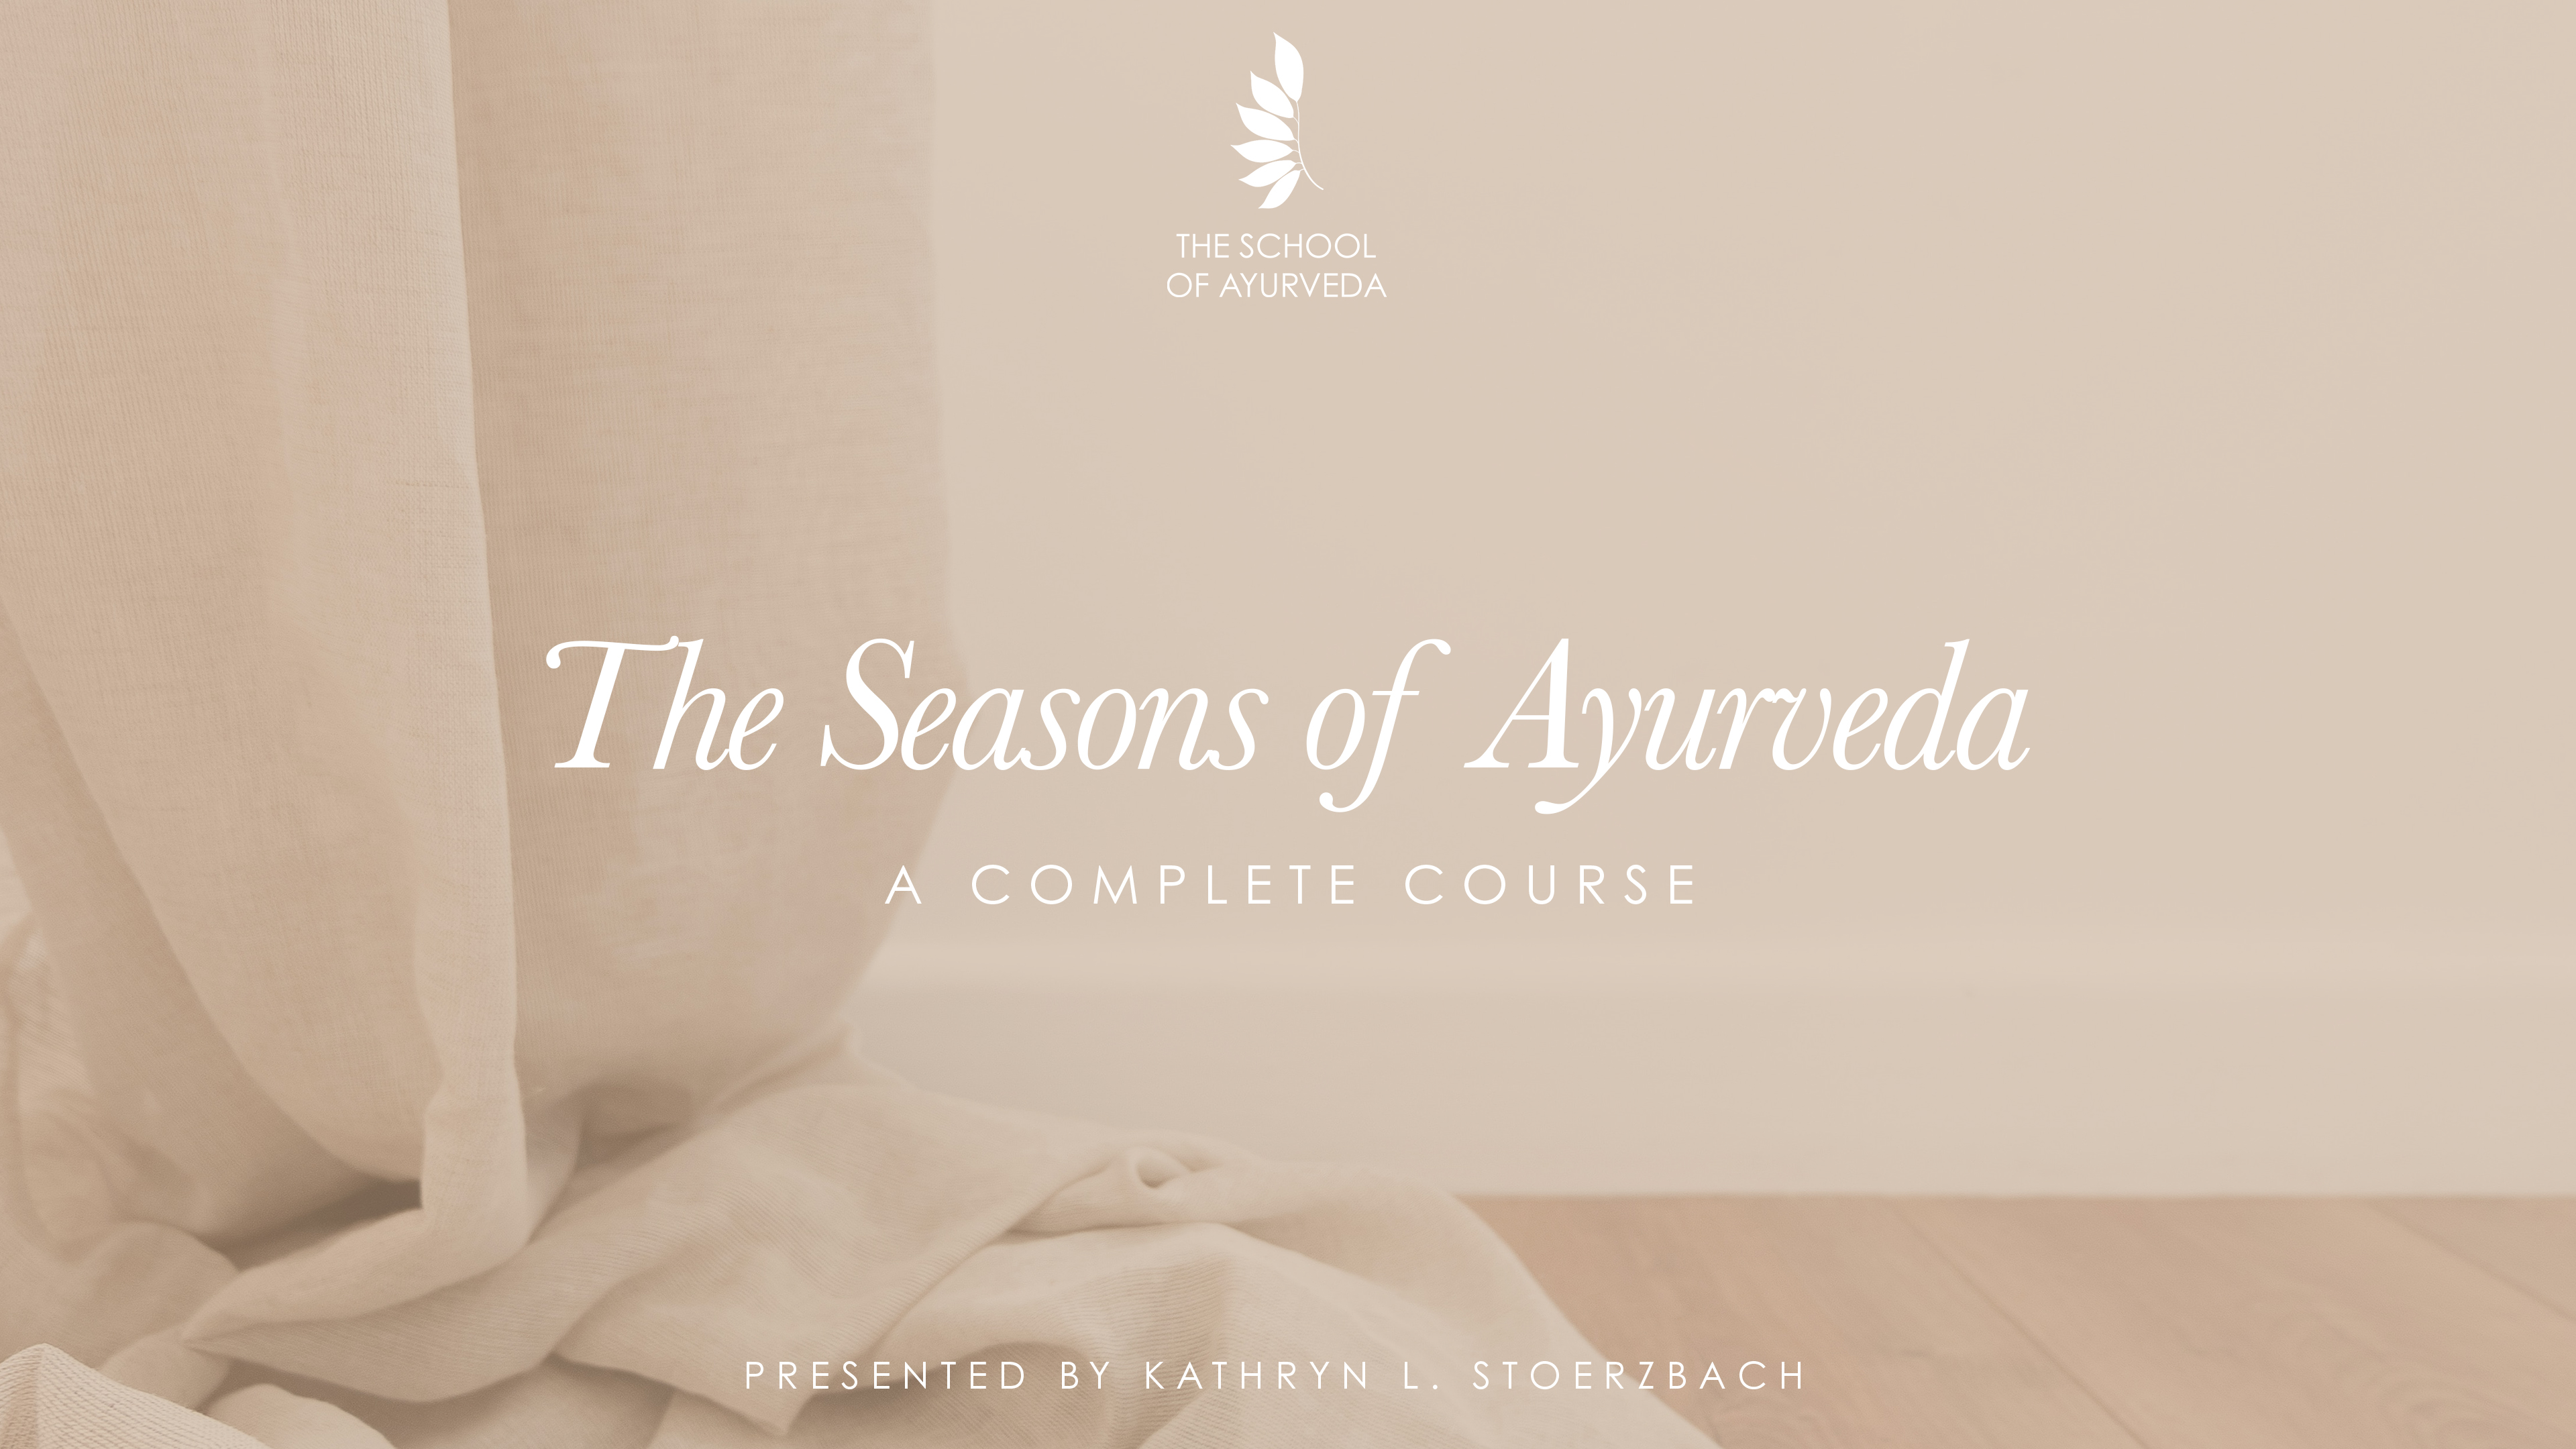 The Seasons of Ayurveda Comprehensive Course.